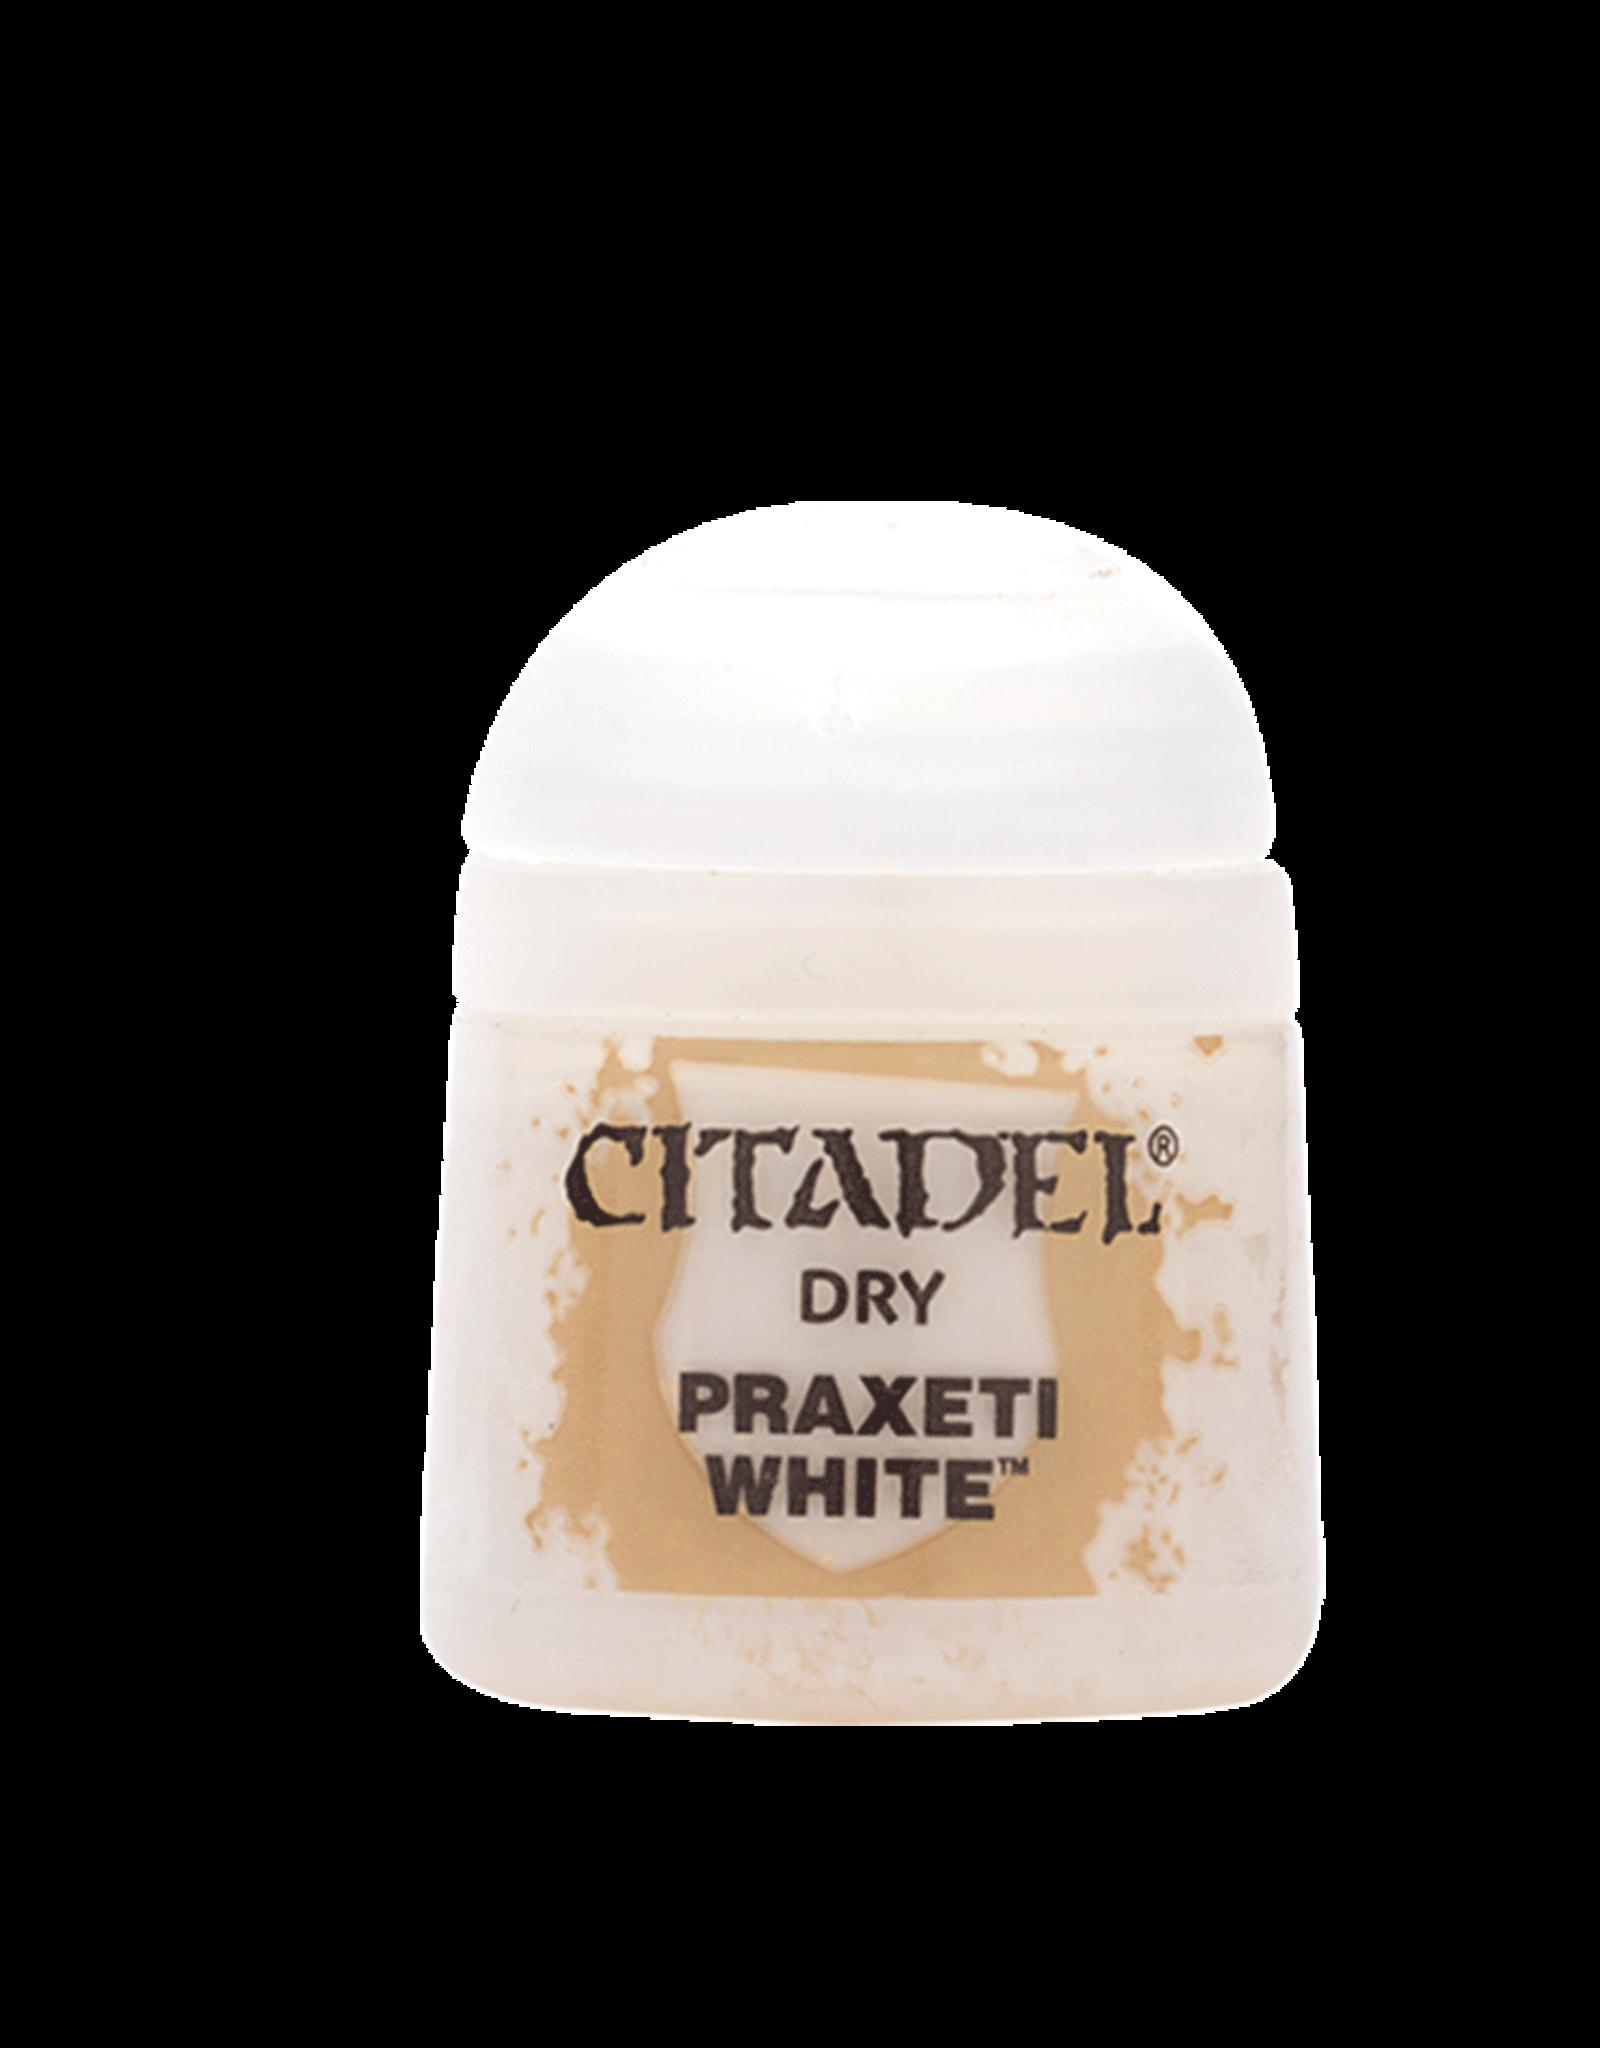 Citadel Citadel Dry: Praxeti White (12ml)